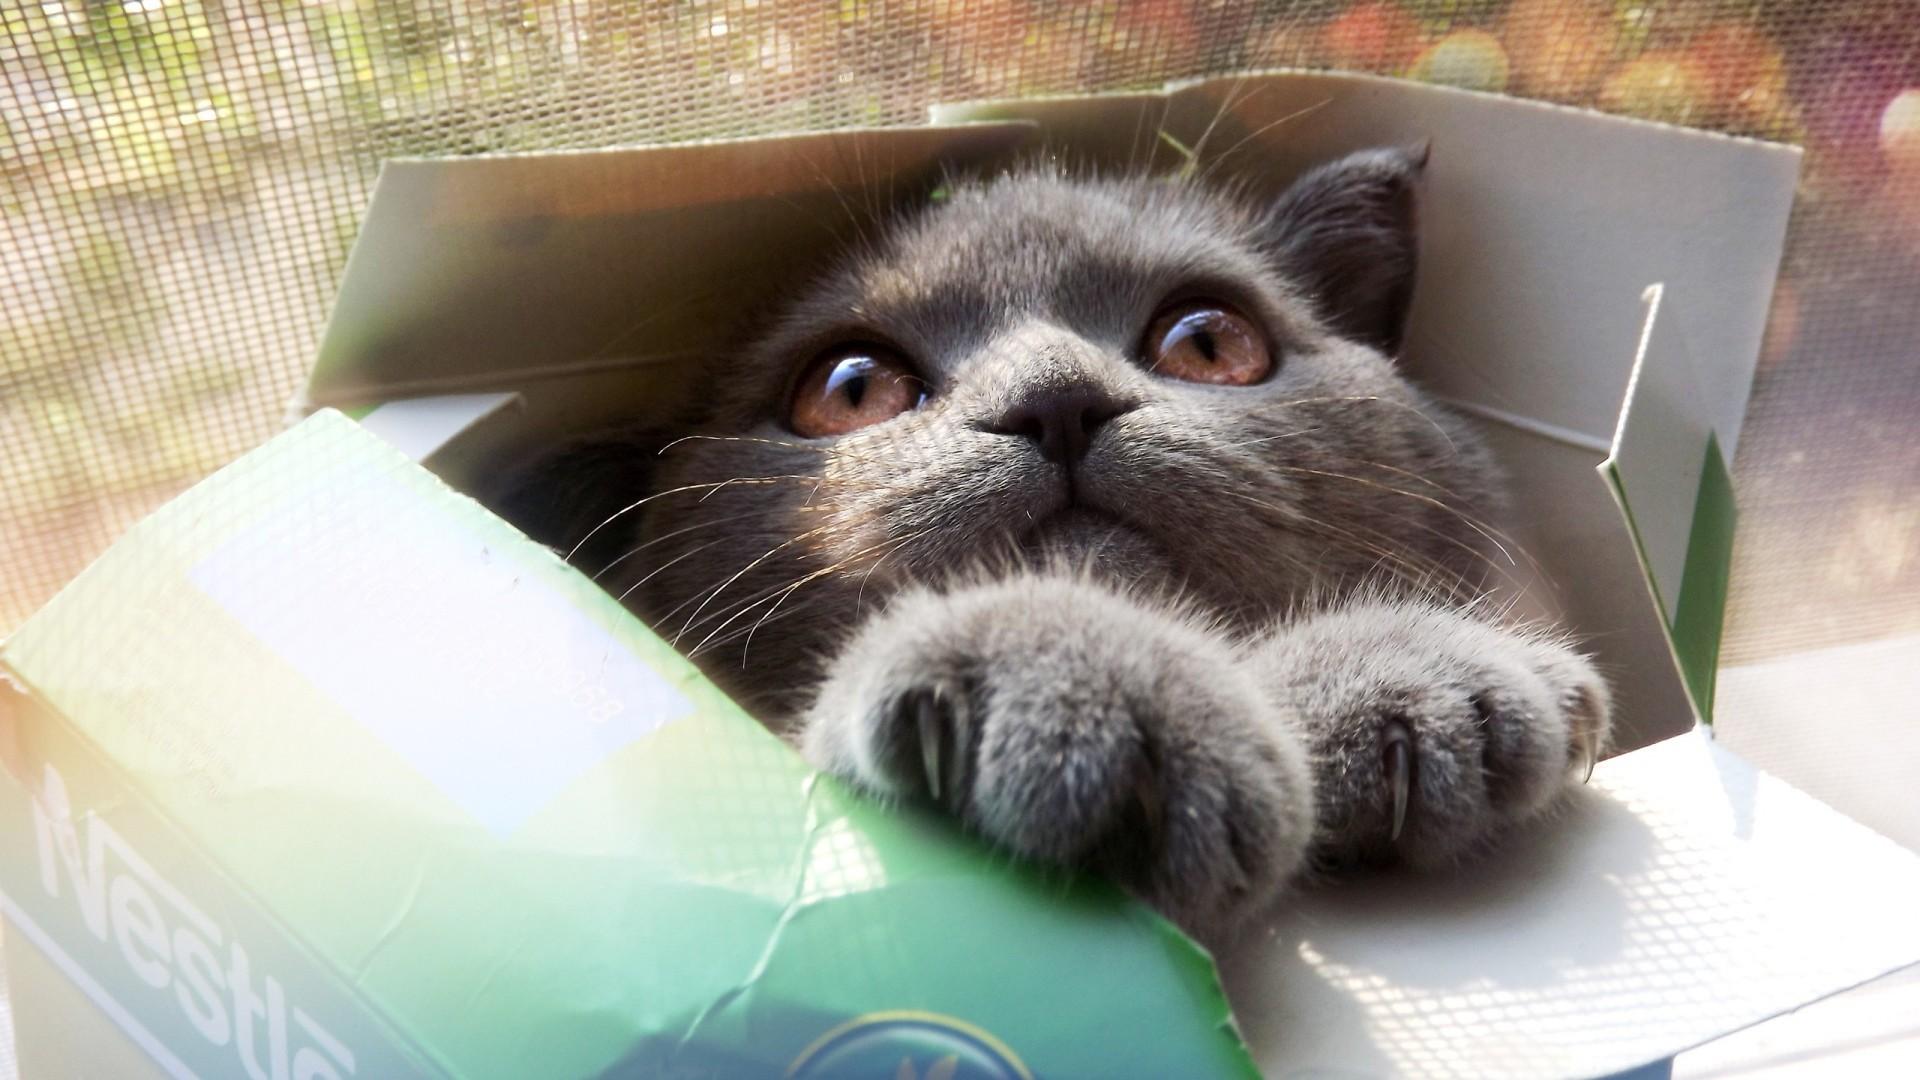 Wallpaper kitten, cat, box, cool cat, funny cat, funny